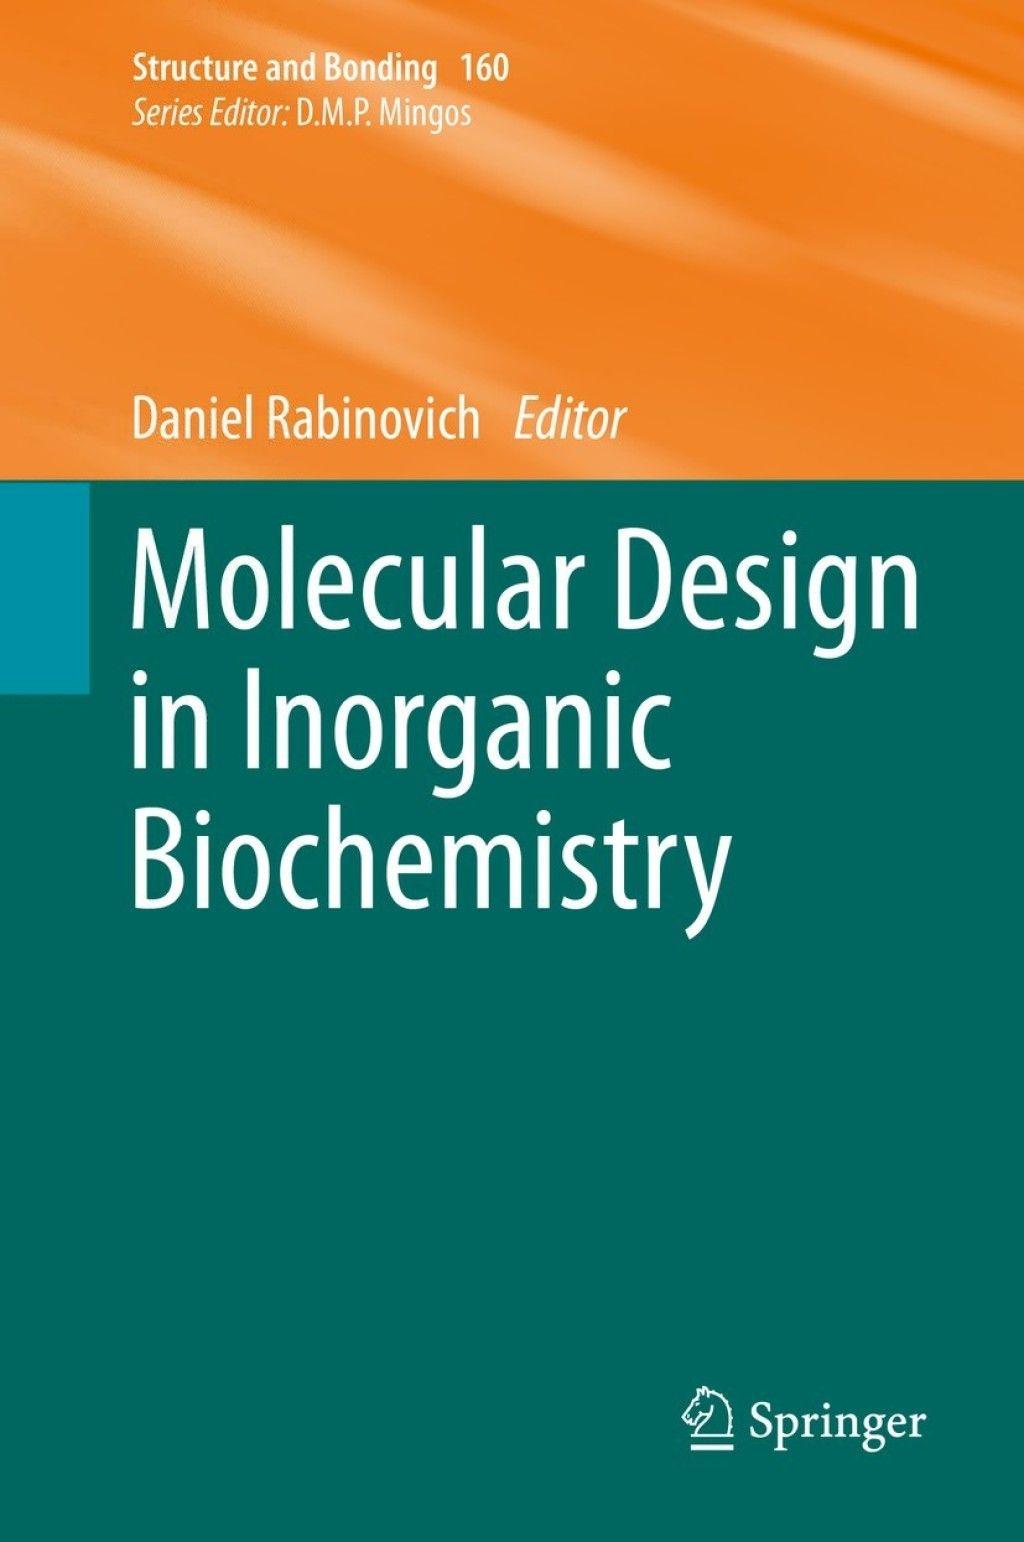 Molecular Design In Inorganic Biochemistry Ebook